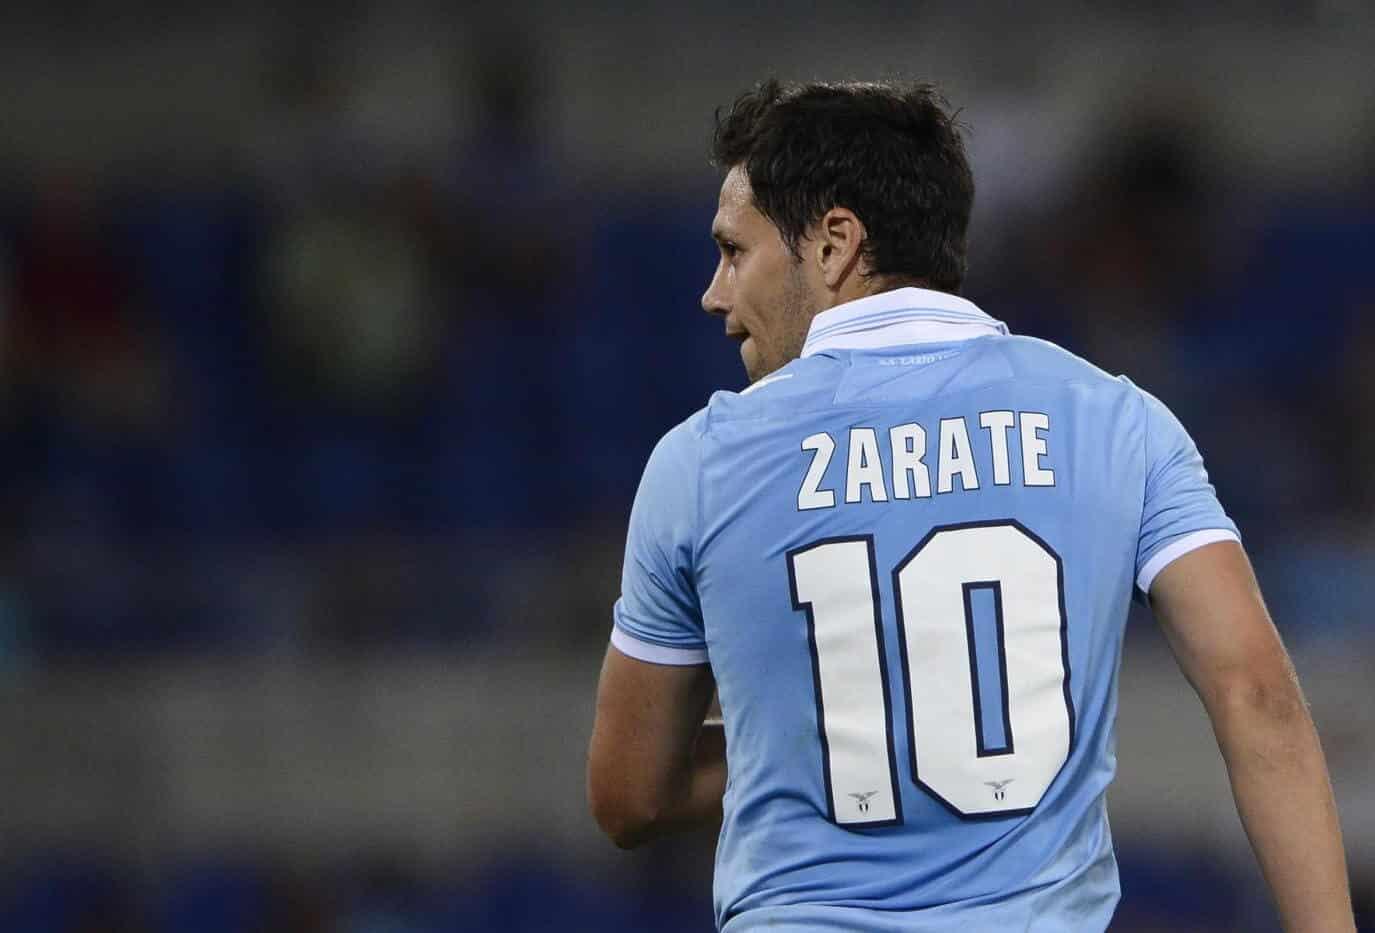 Mauro Zarate